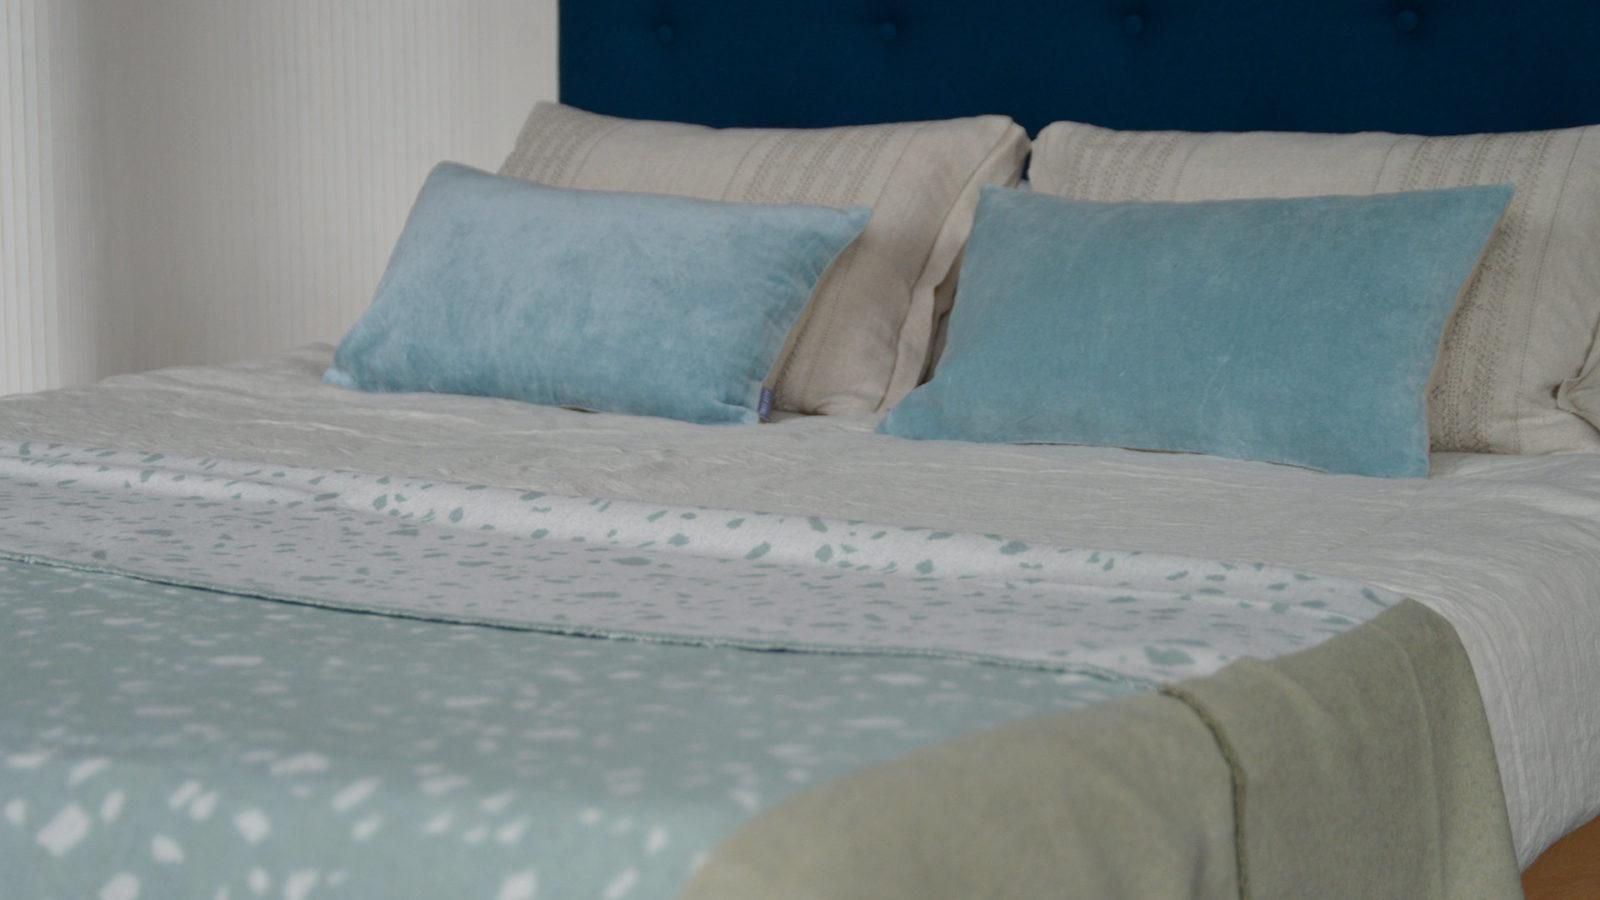 aqua-terrazzo-design-cosy-throw